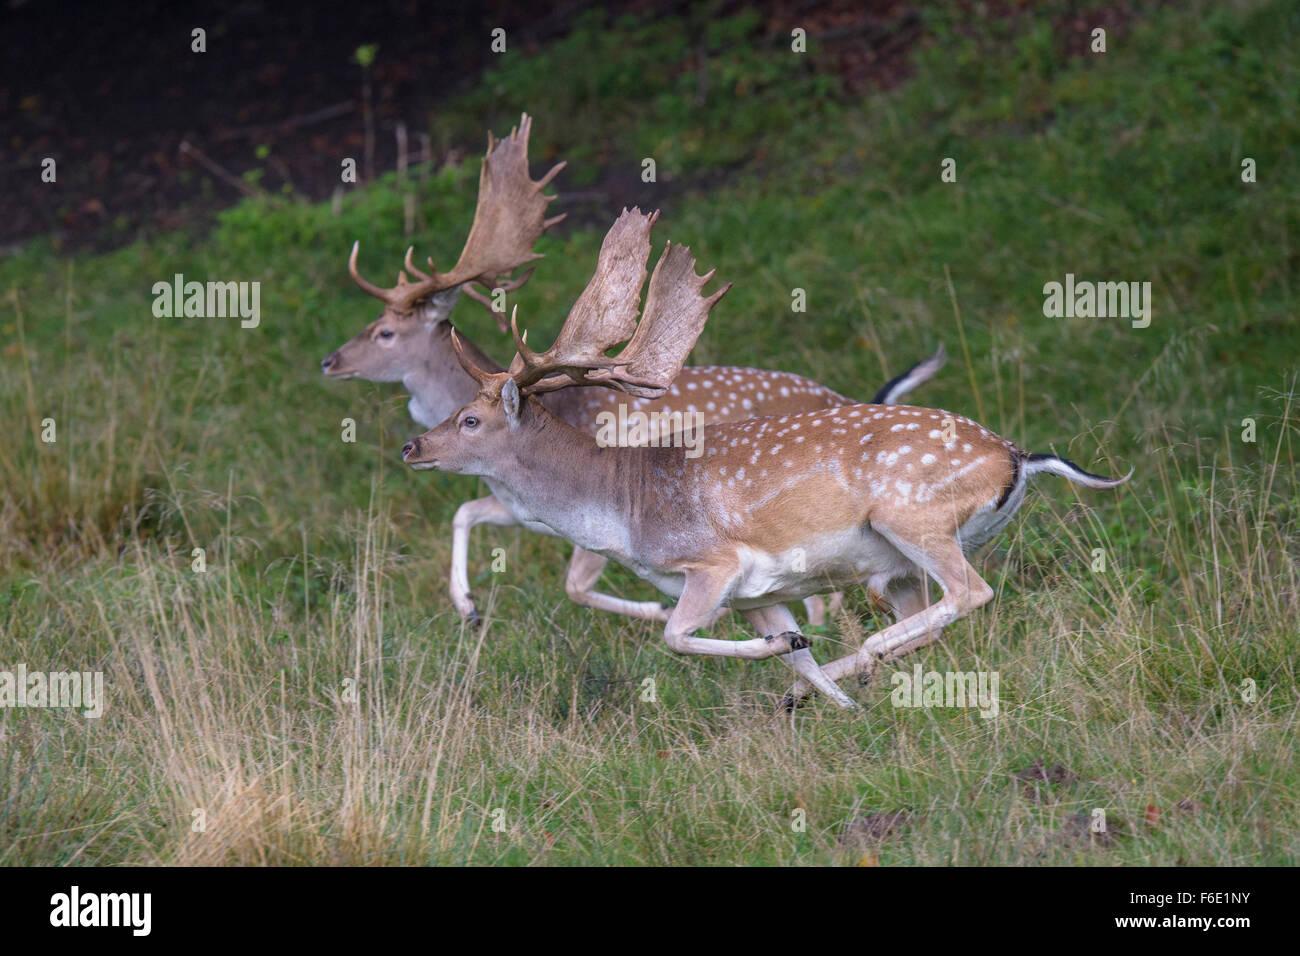 Fallow deer (Dama dama), bucks fleeing, Zealand, Denmark - Stock Image